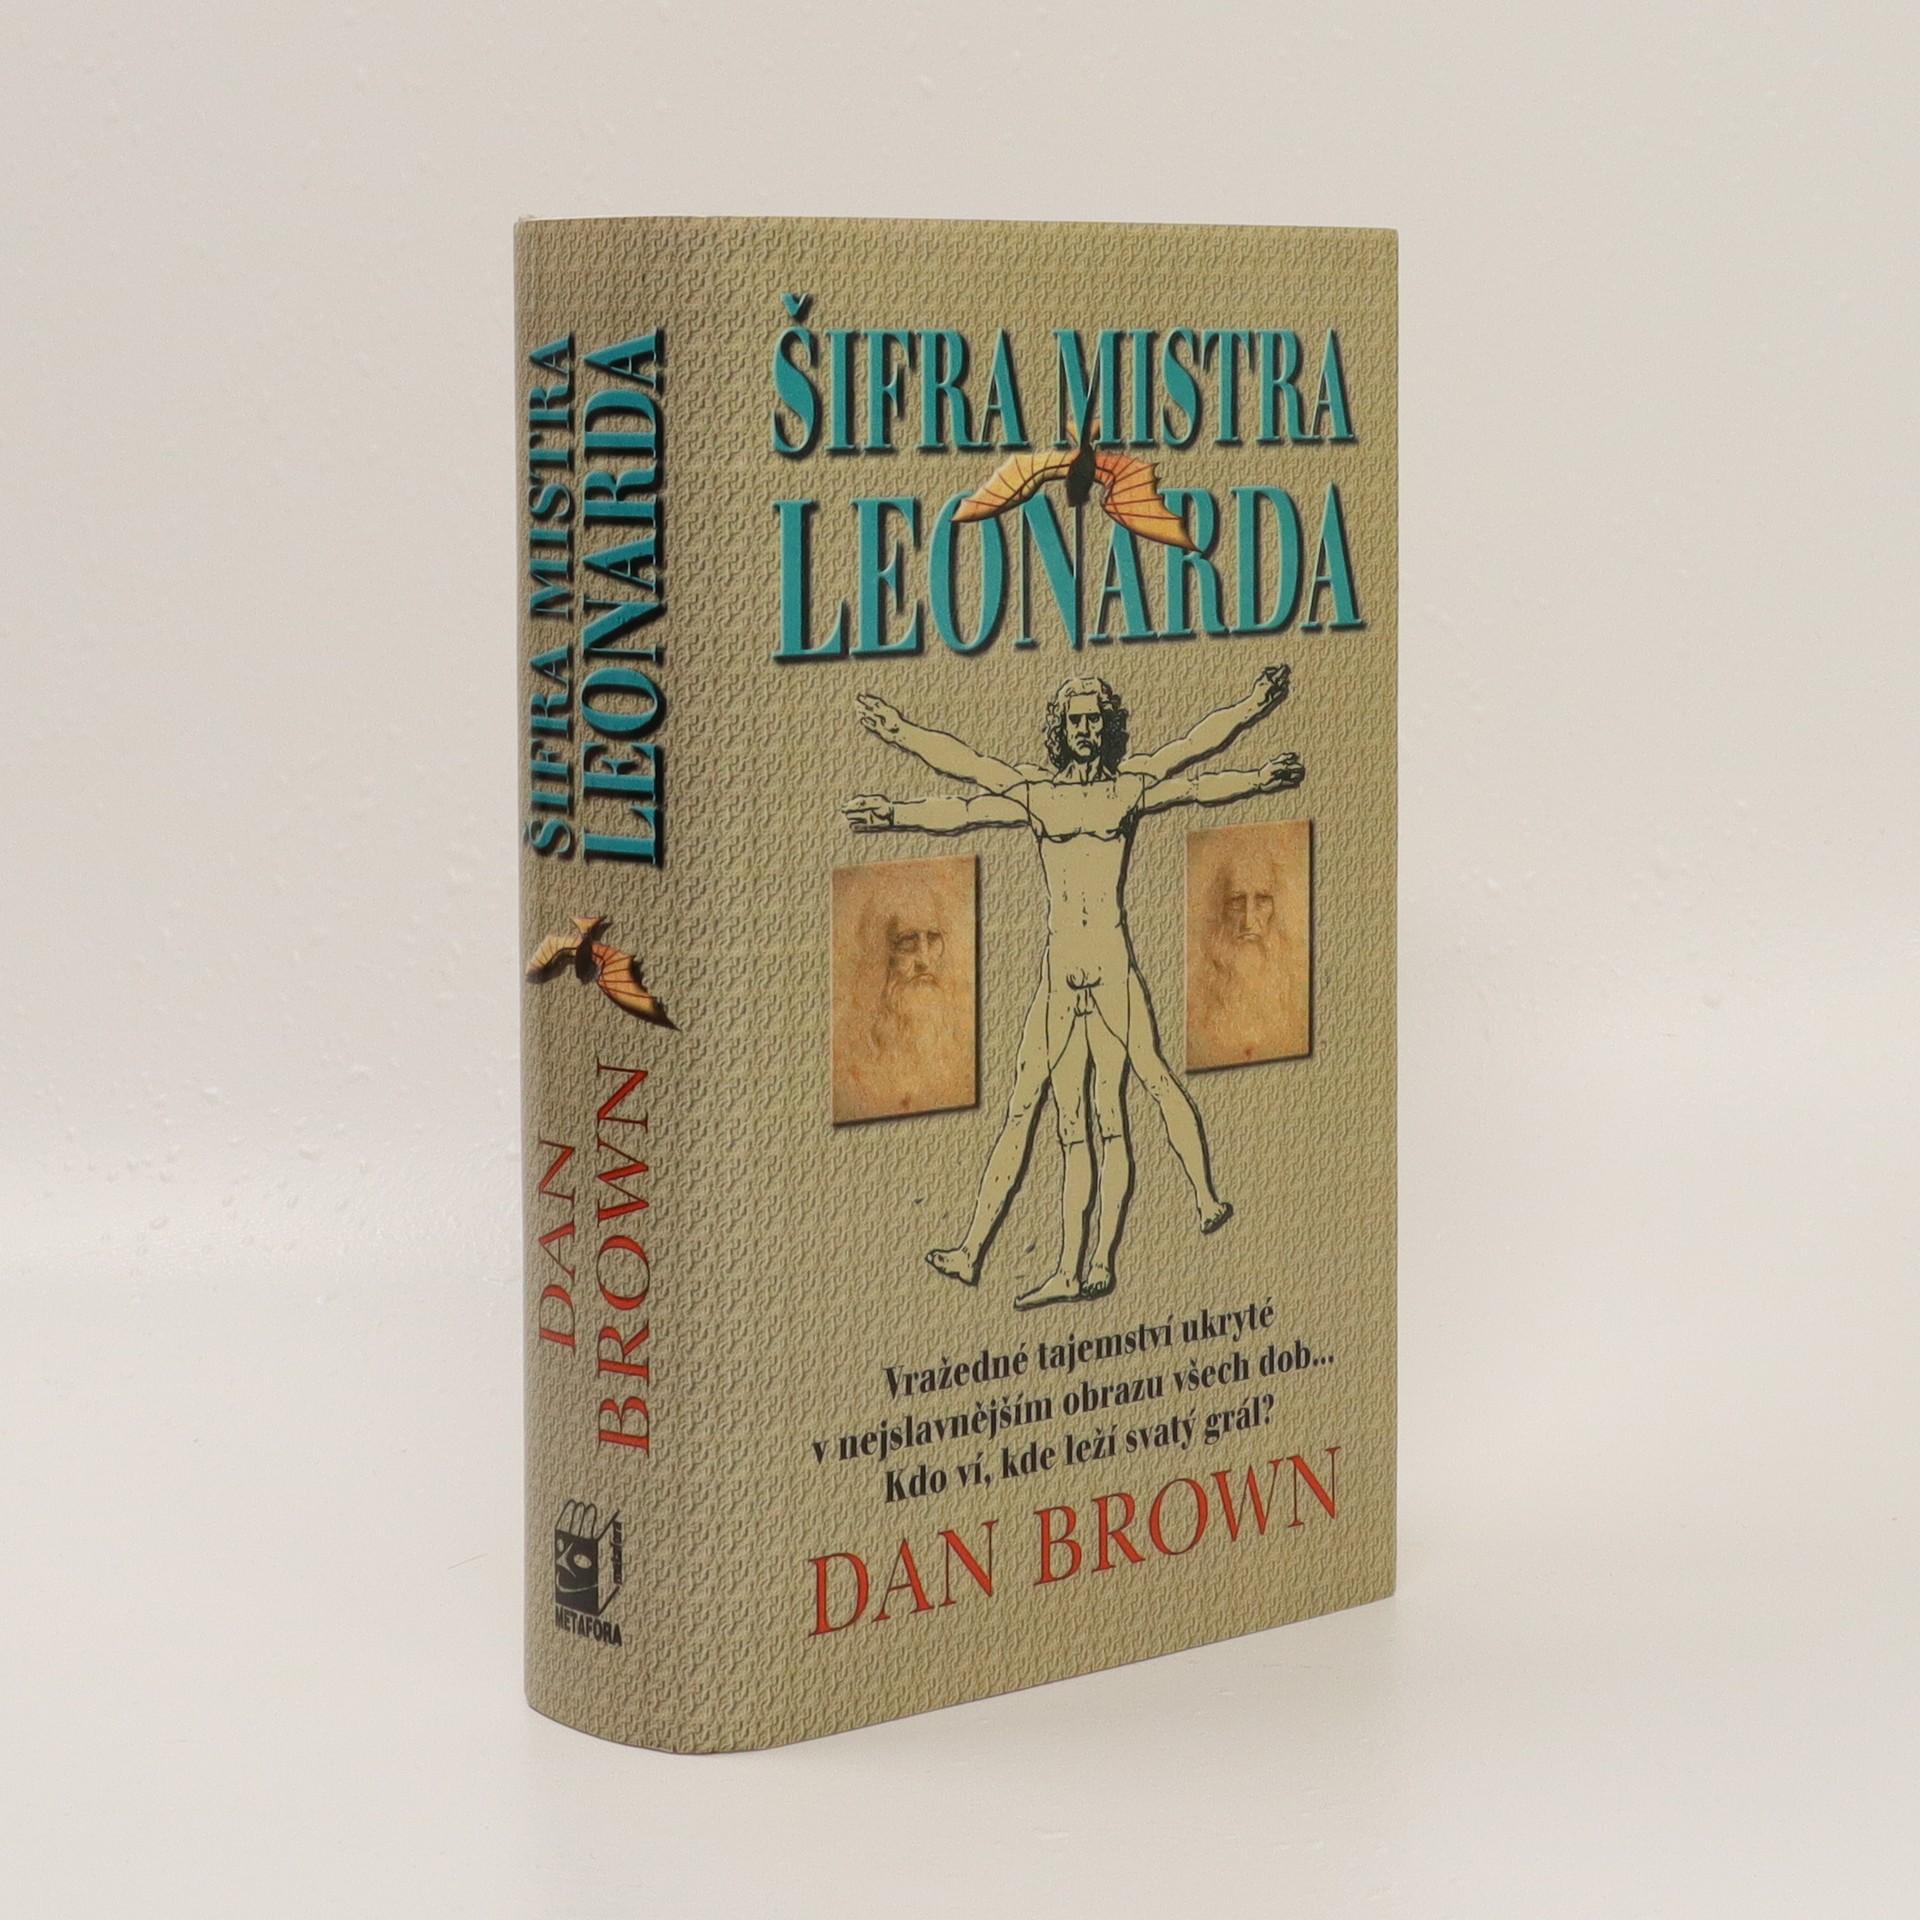 antikvární kniha Šifra mistra Leonarda, 2003